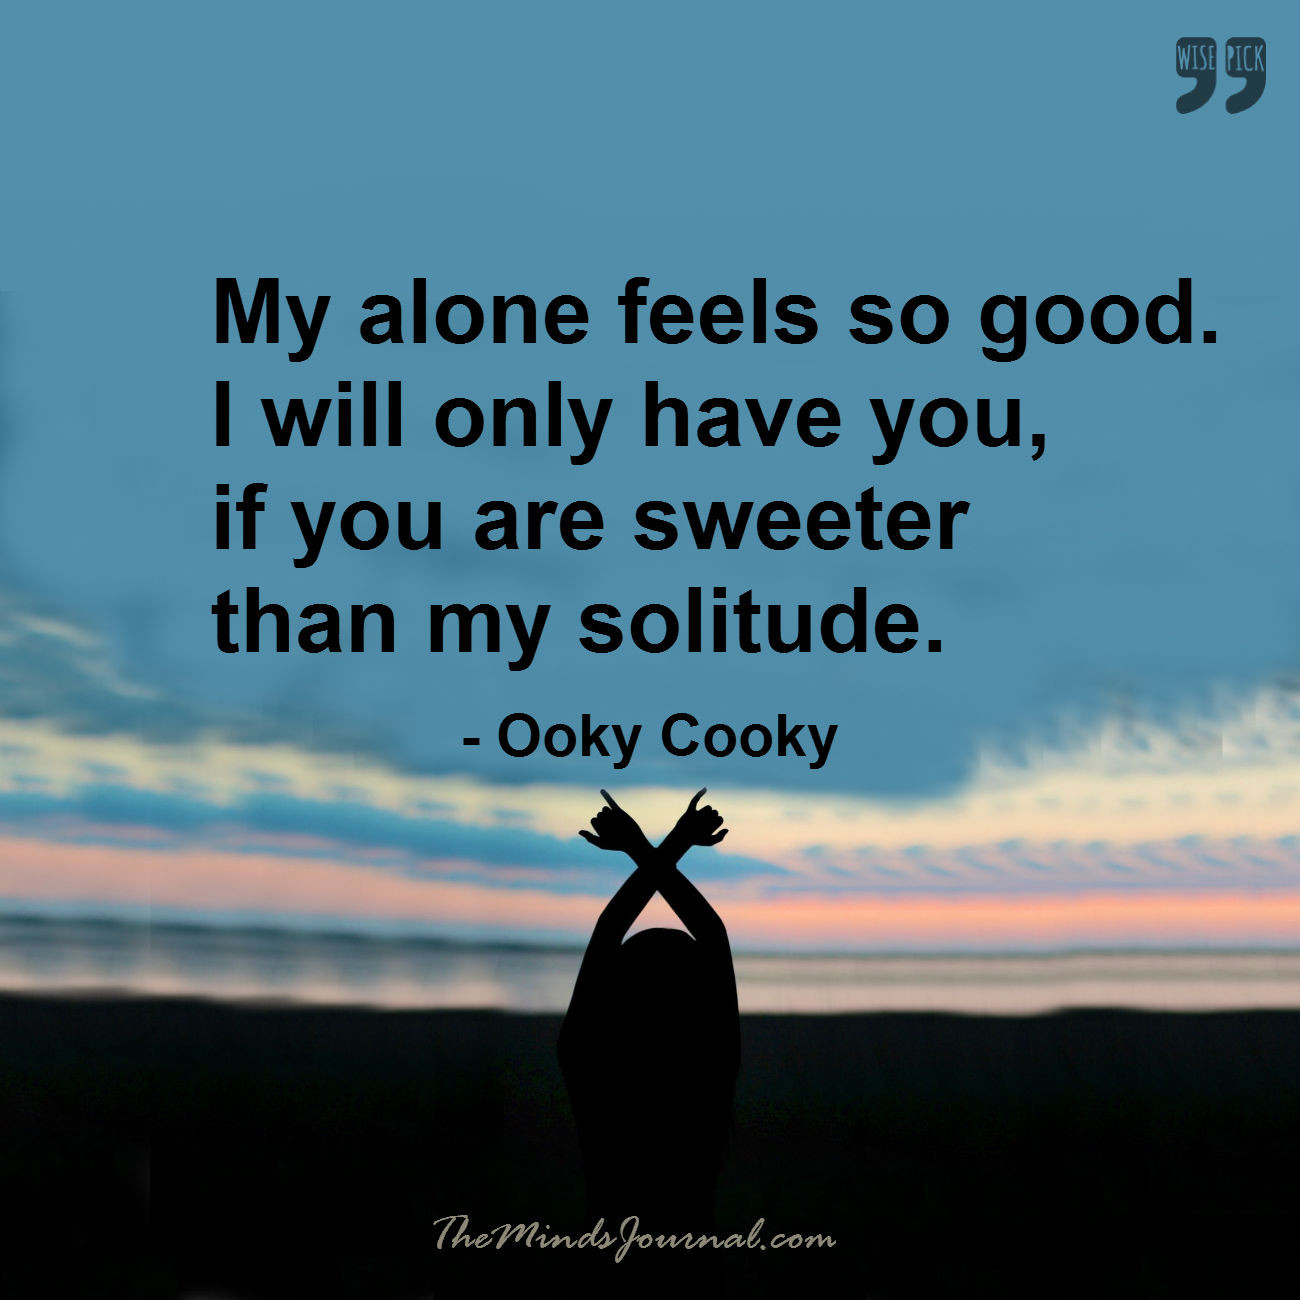 My alone feels so good